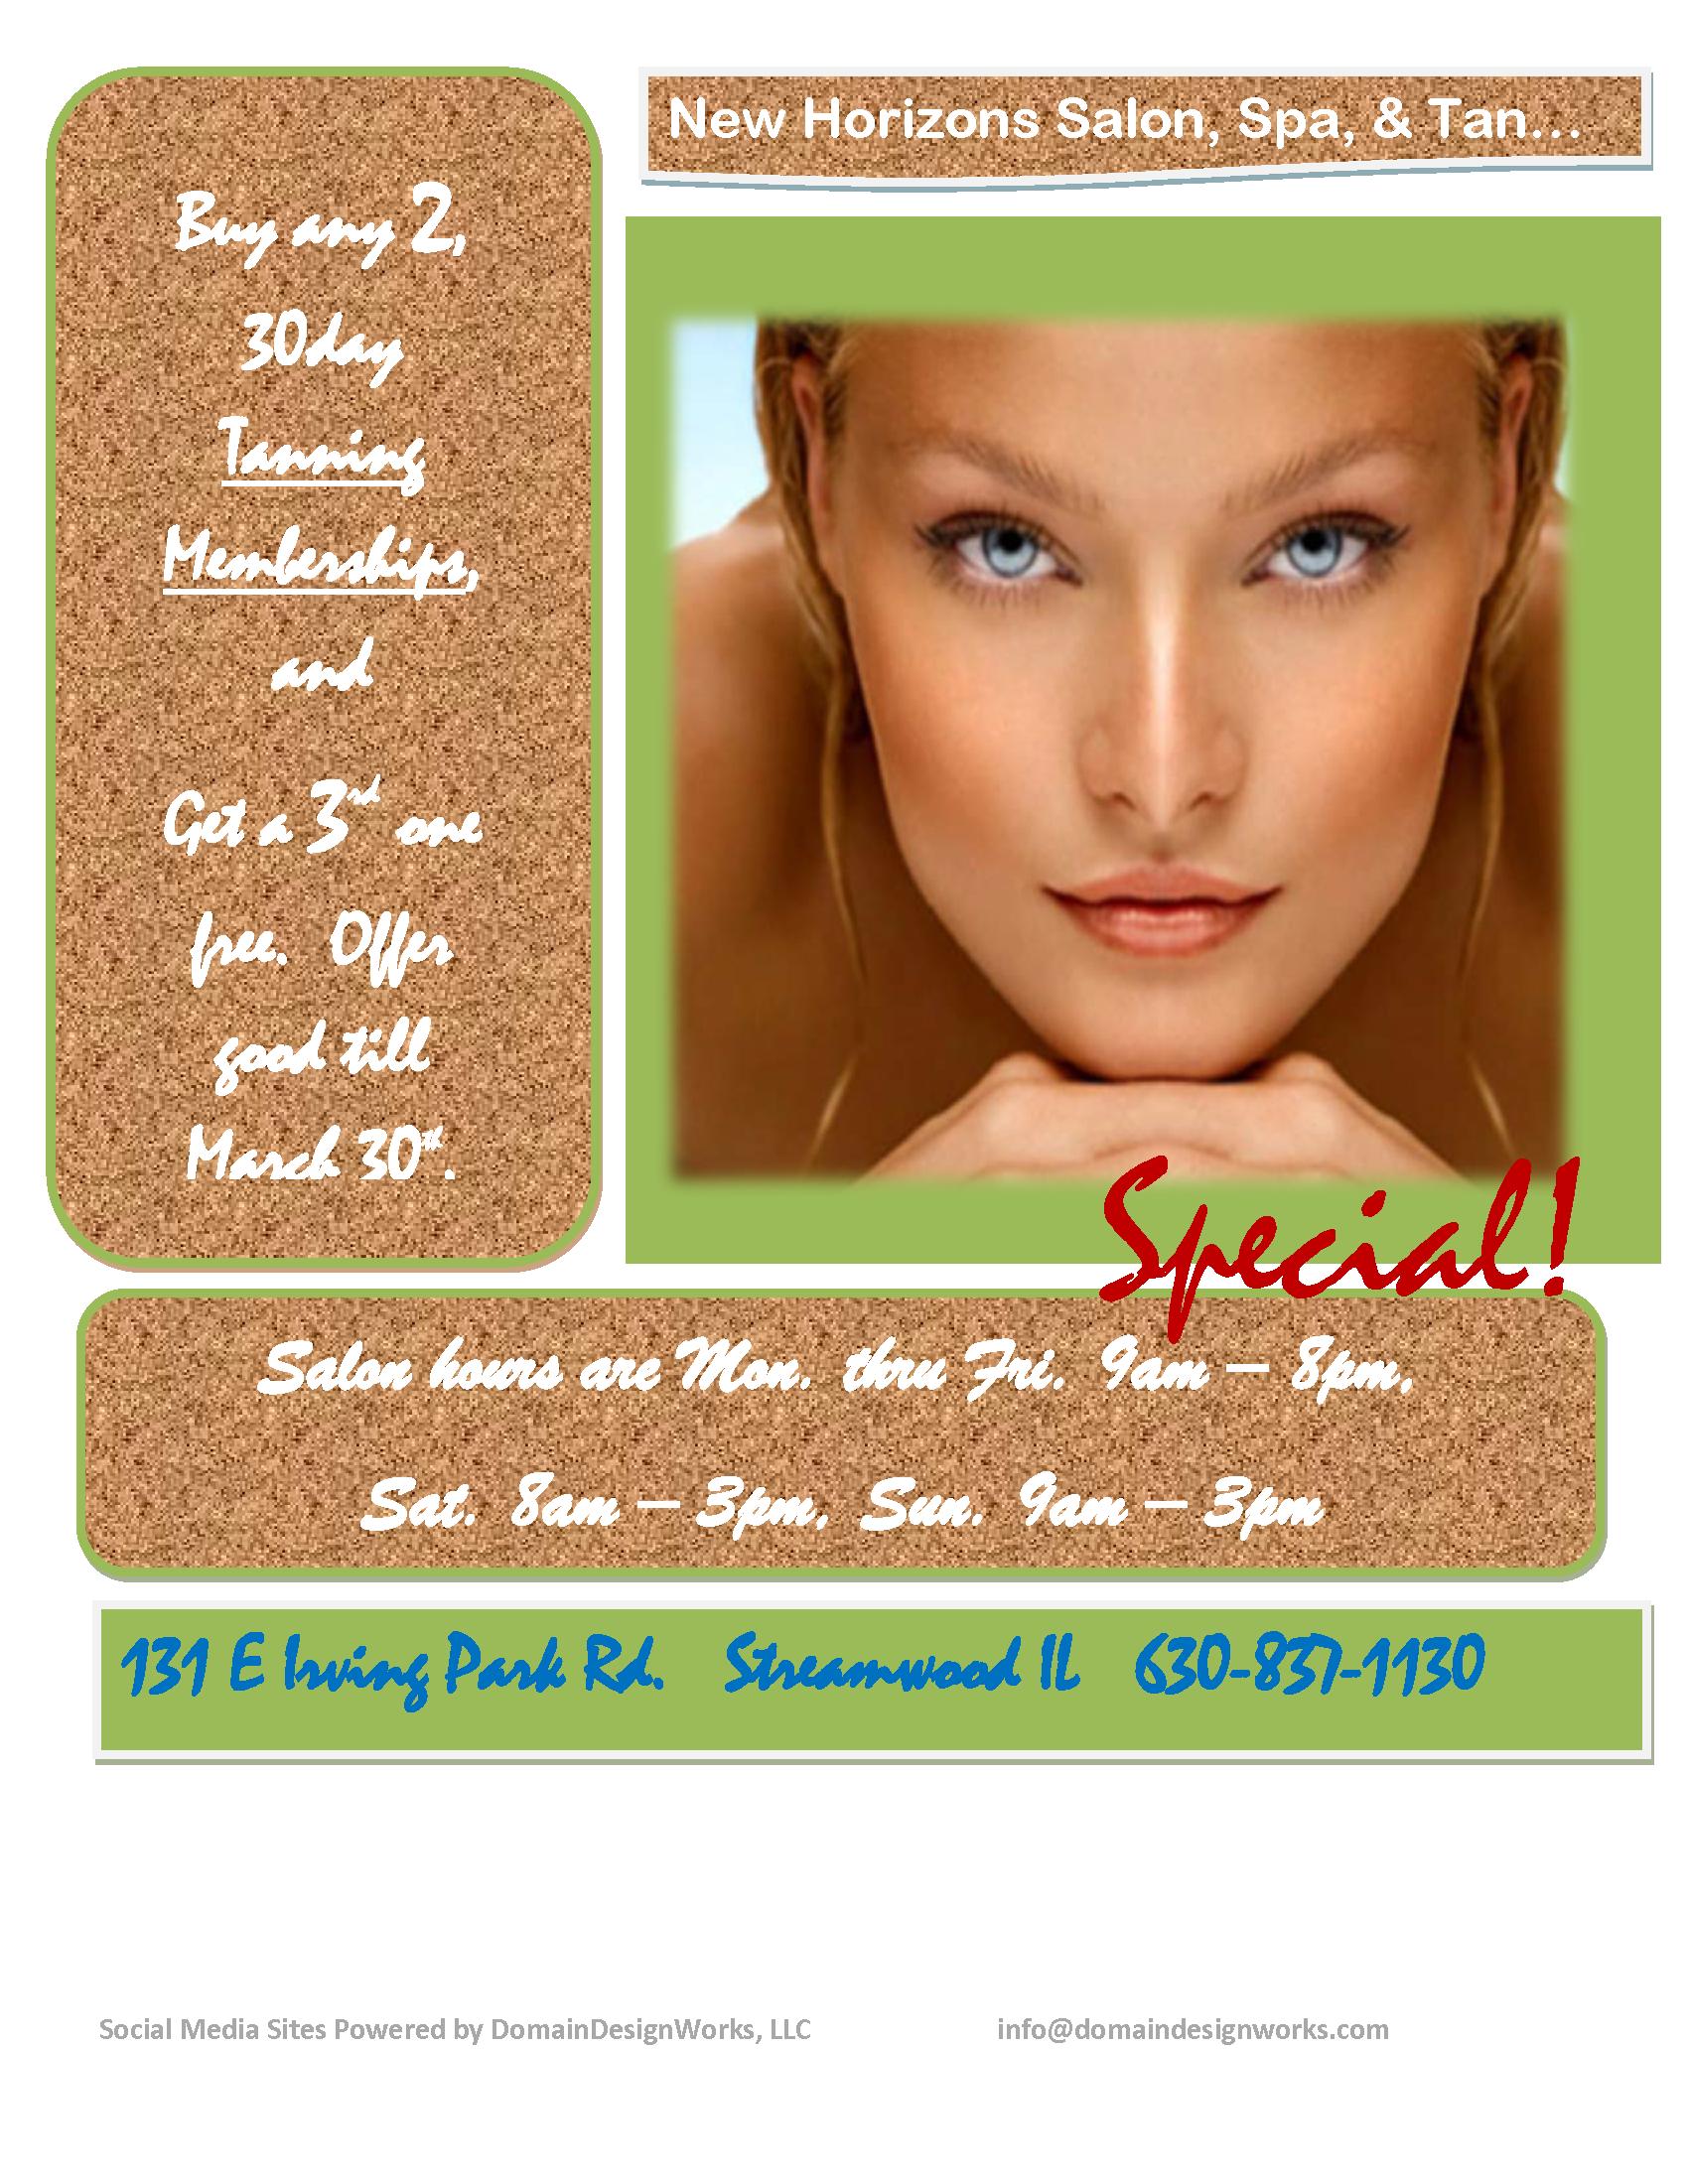 New Horizons Salon Spa & Tan Walkins call for